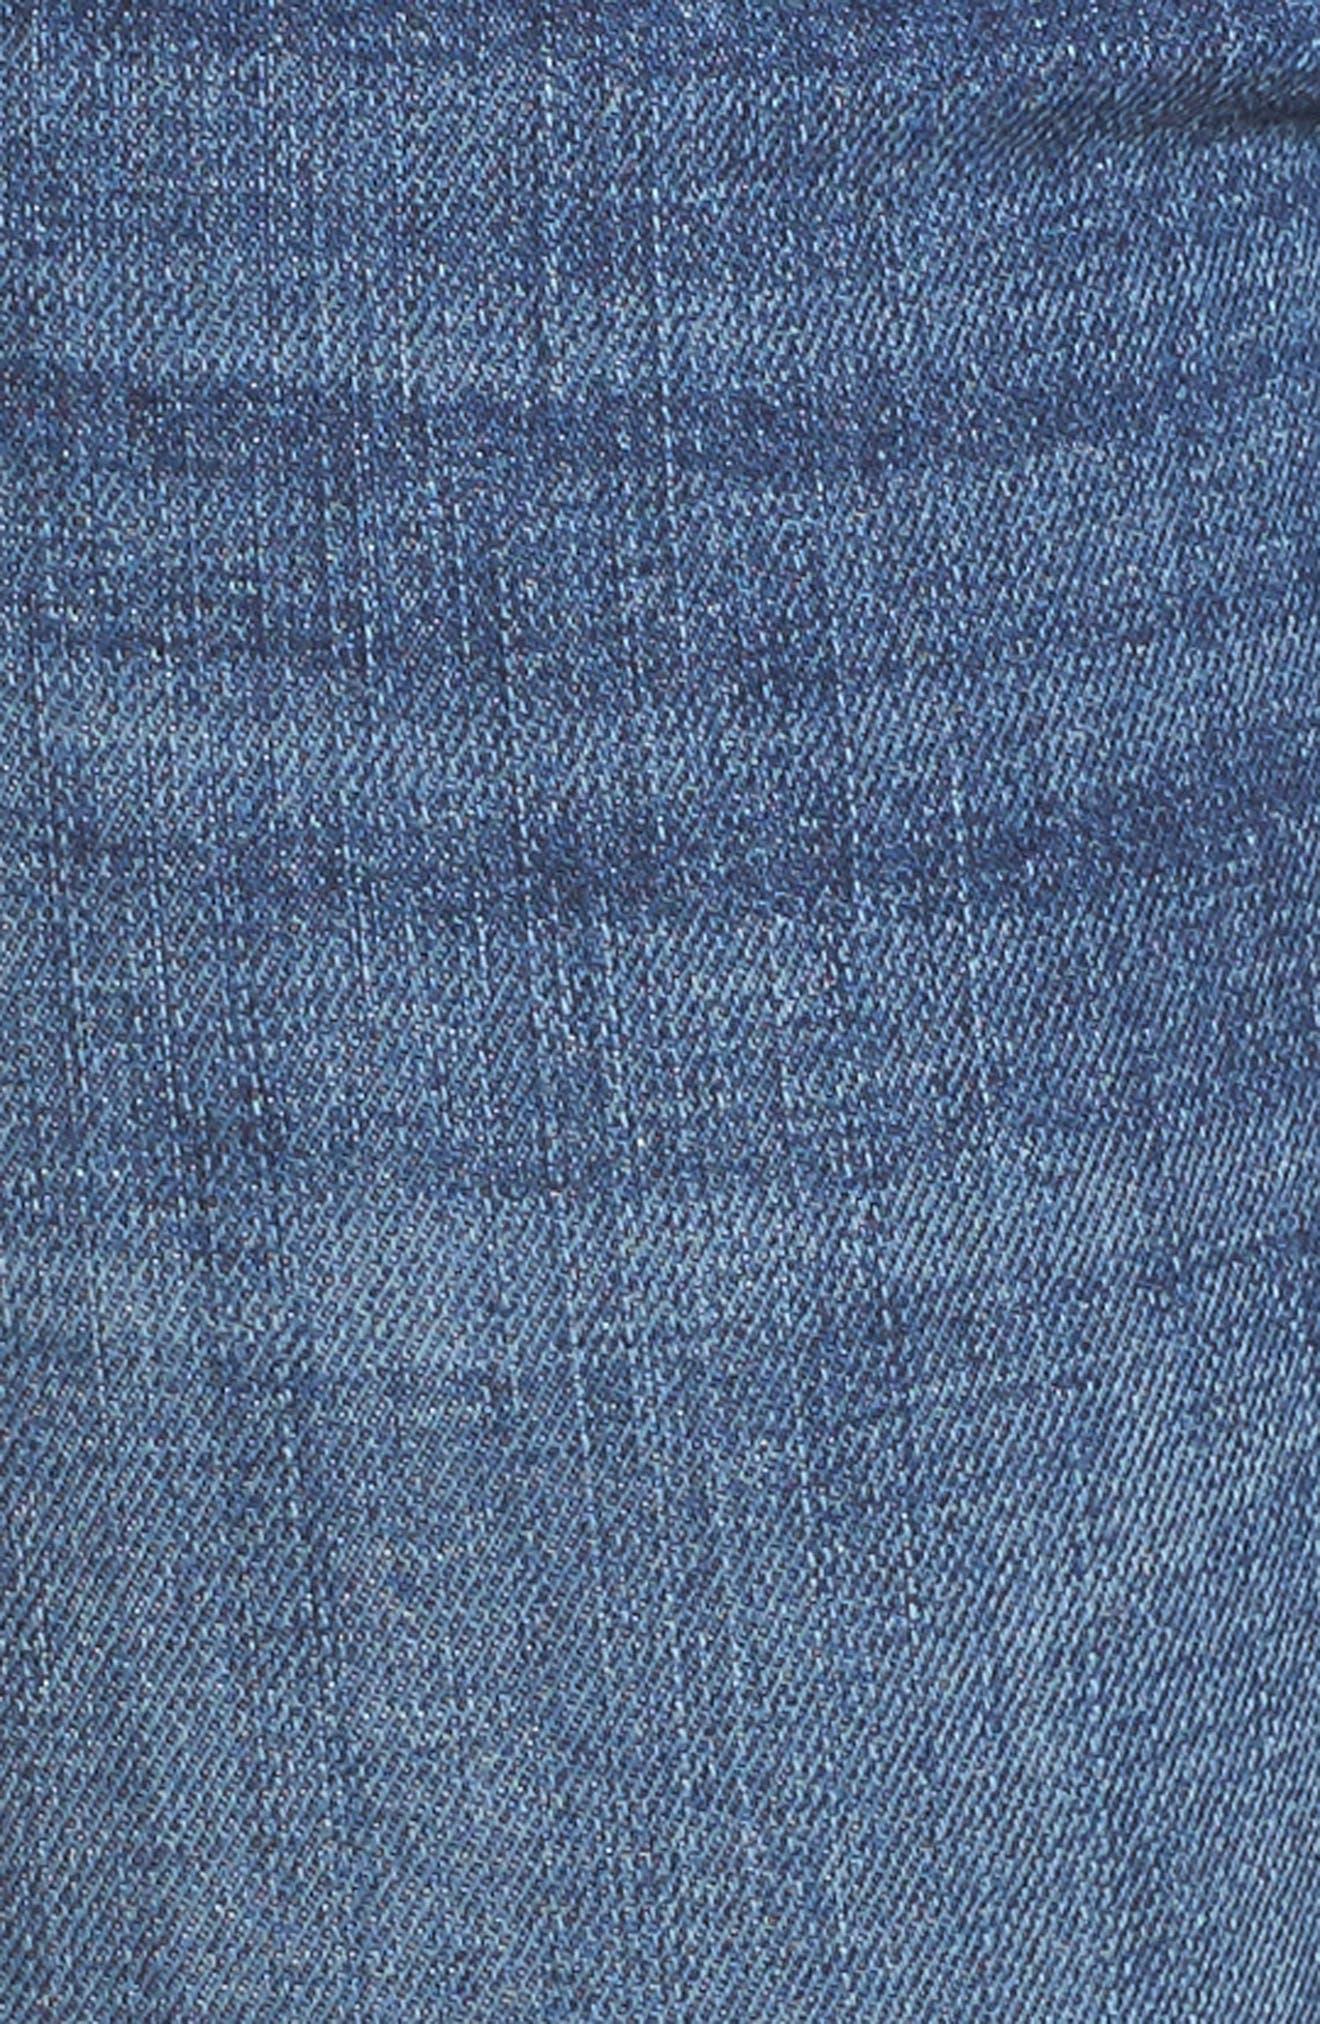 Maternity Skinny Jeans,                             Alternate thumbnail 5, color,                             Juliet Wash